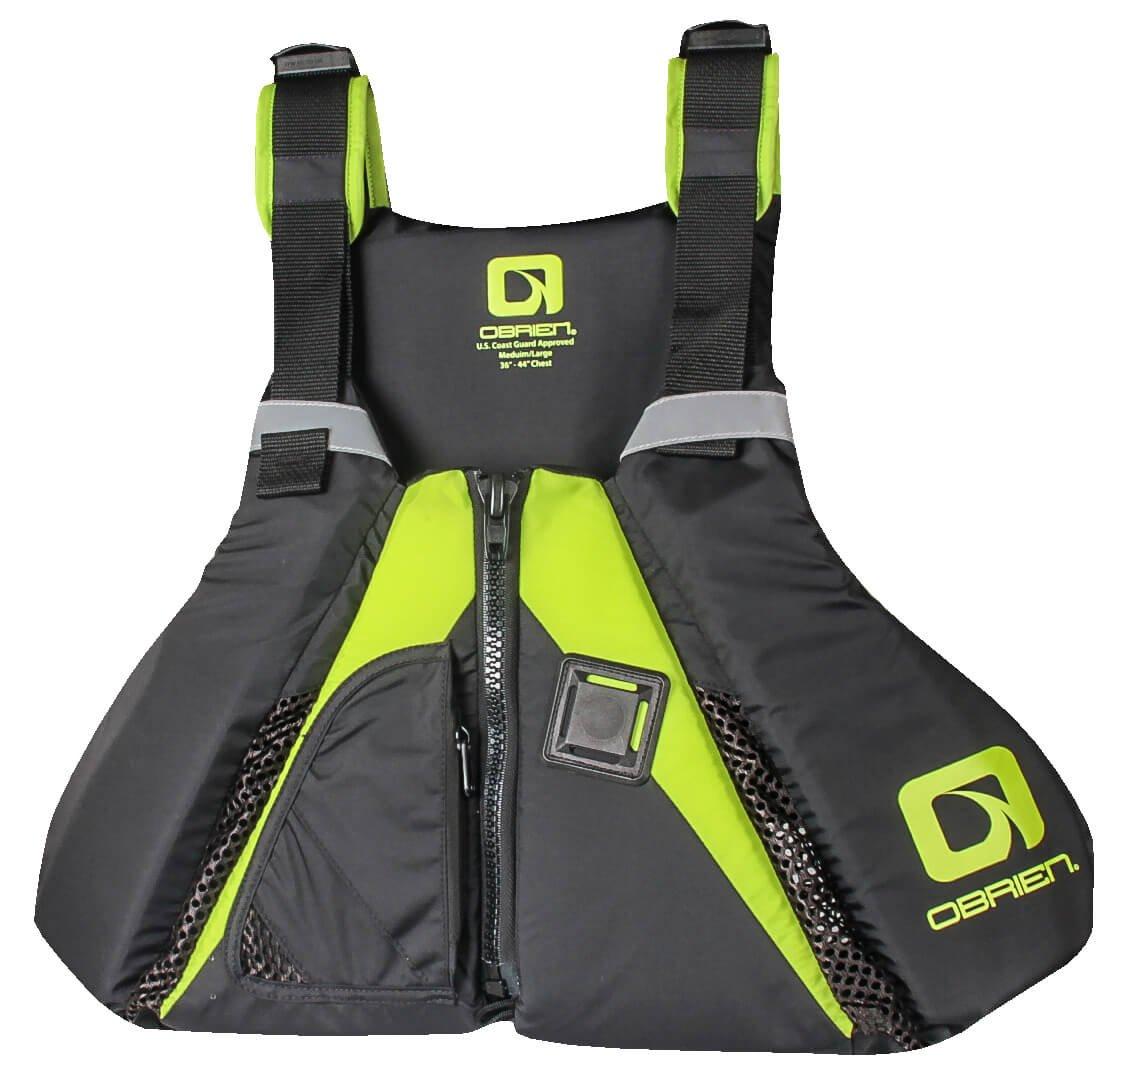 Obrien Arsenal Stand Up Paddleboard Vest XL/XXL Black/Green   B01N7WSN4S